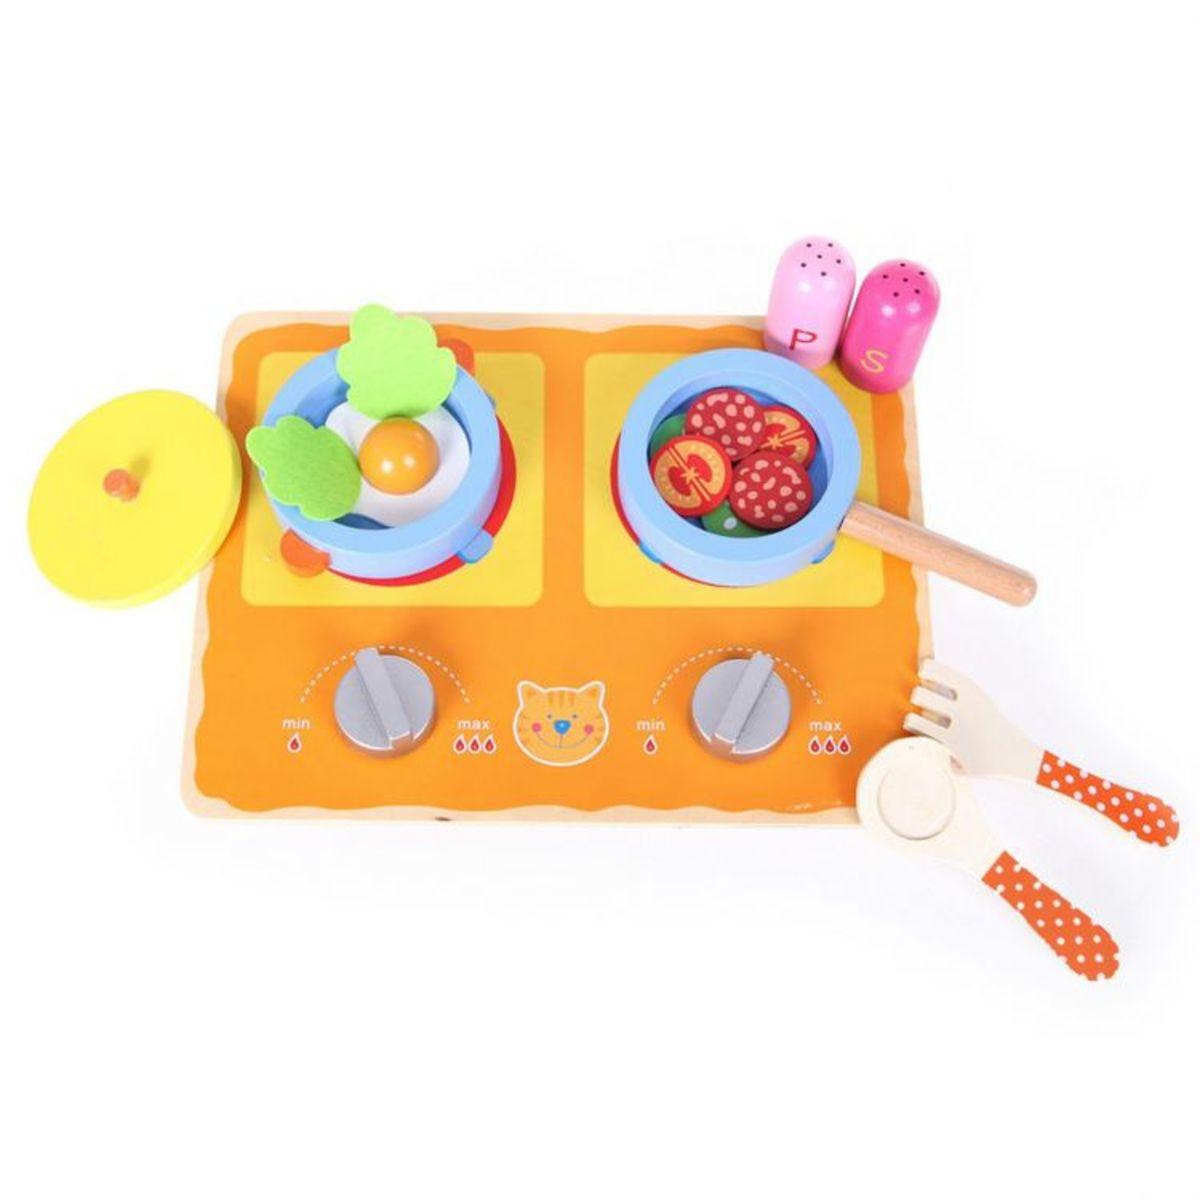 Detská drevená mini kuchynka/varná doska